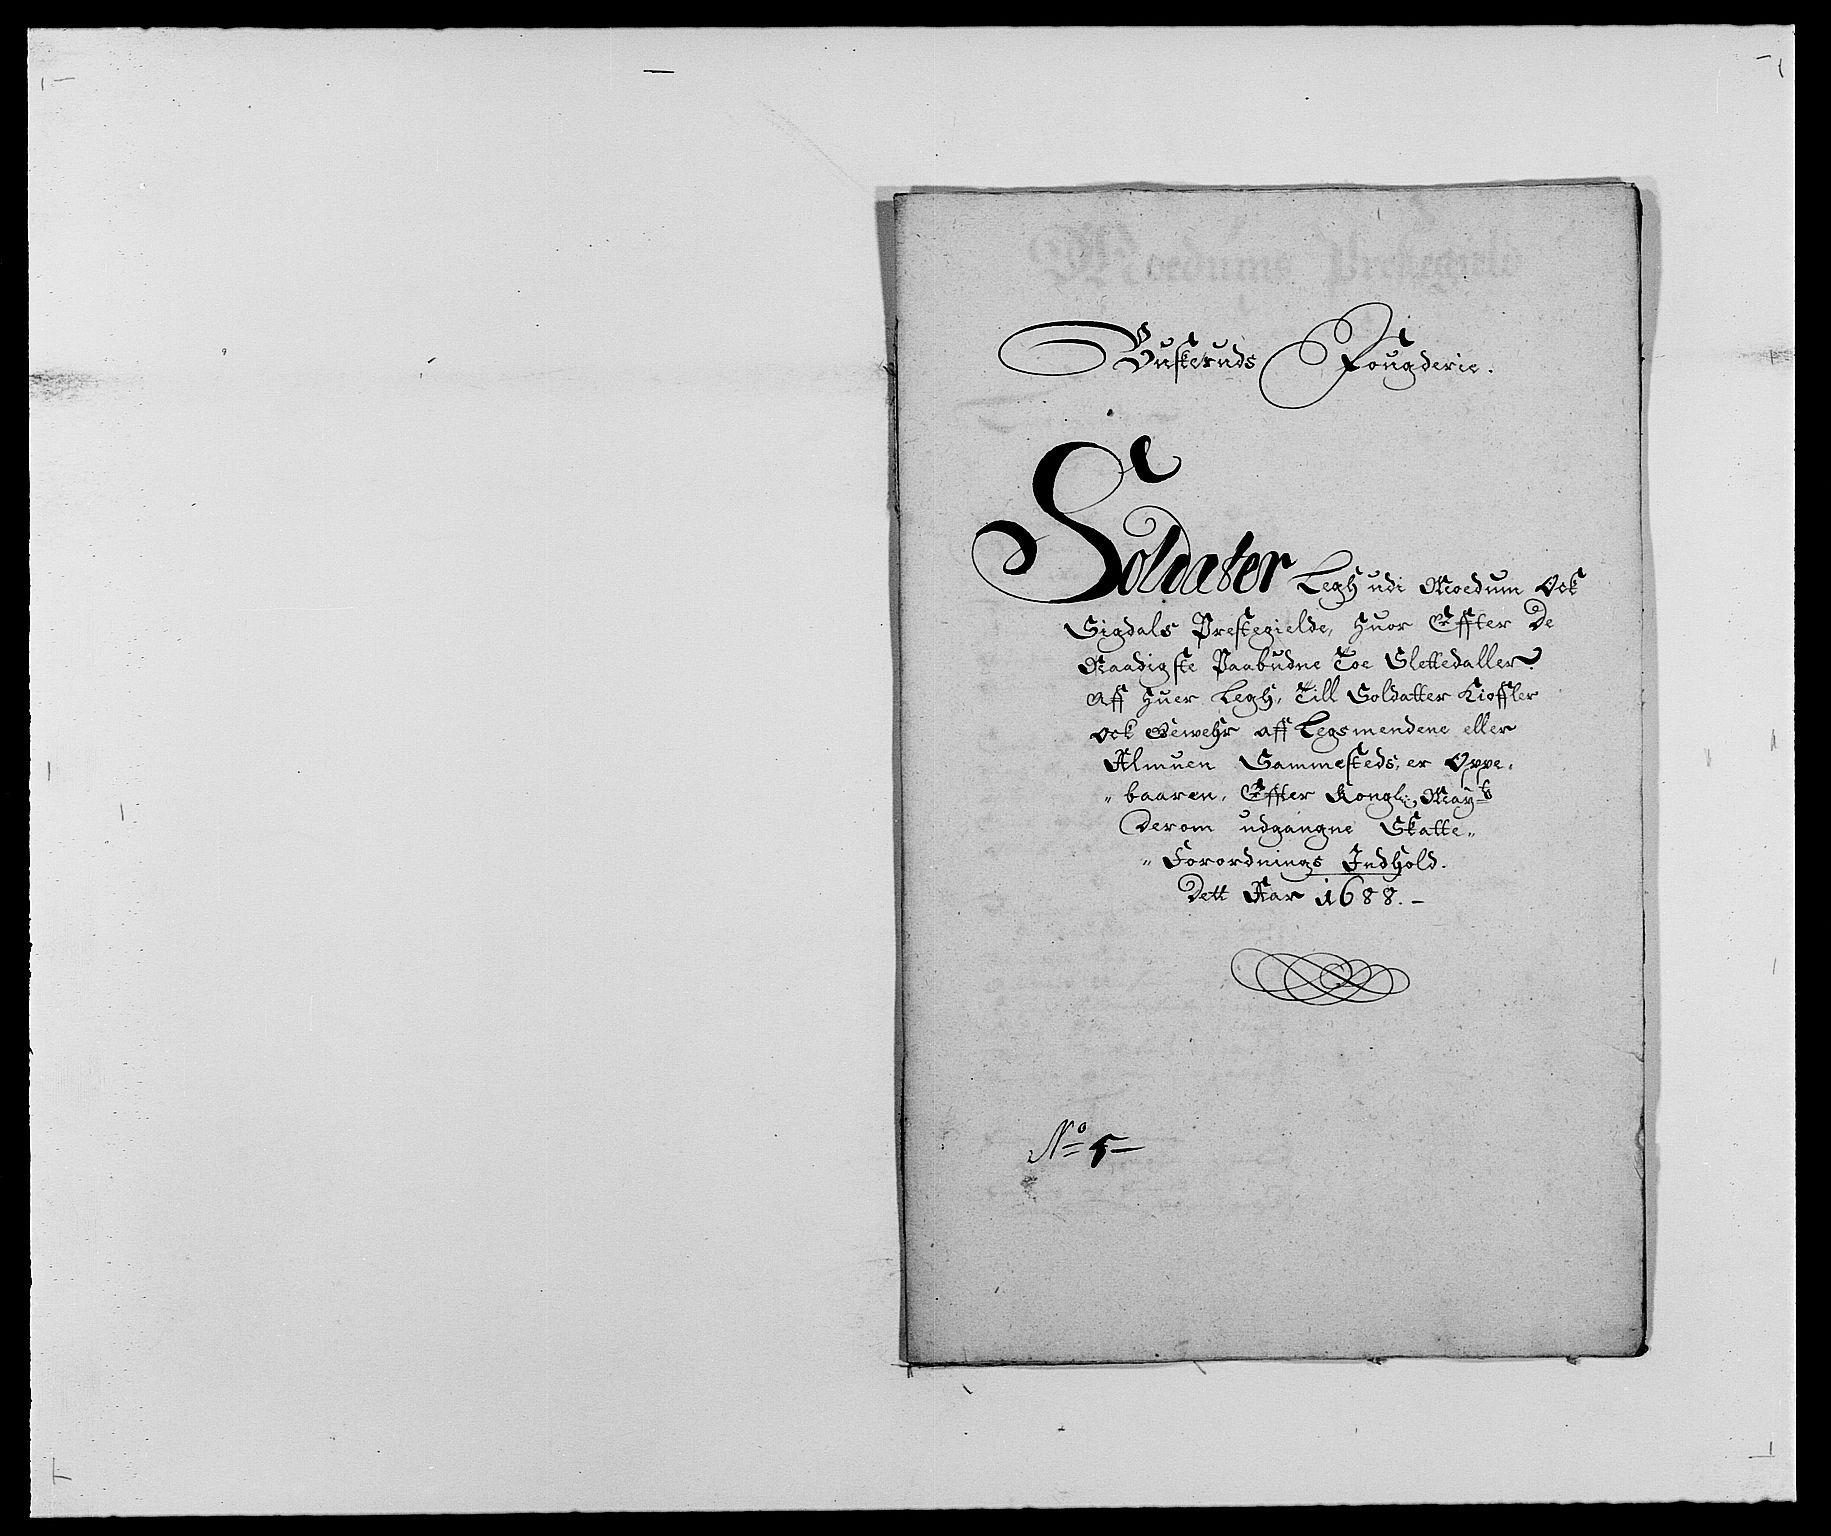 RA, Rentekammeret inntil 1814, Reviderte regnskaper, Fogderegnskap, R25/L1679: Fogderegnskap Buskerud, 1687-1688, s. 418